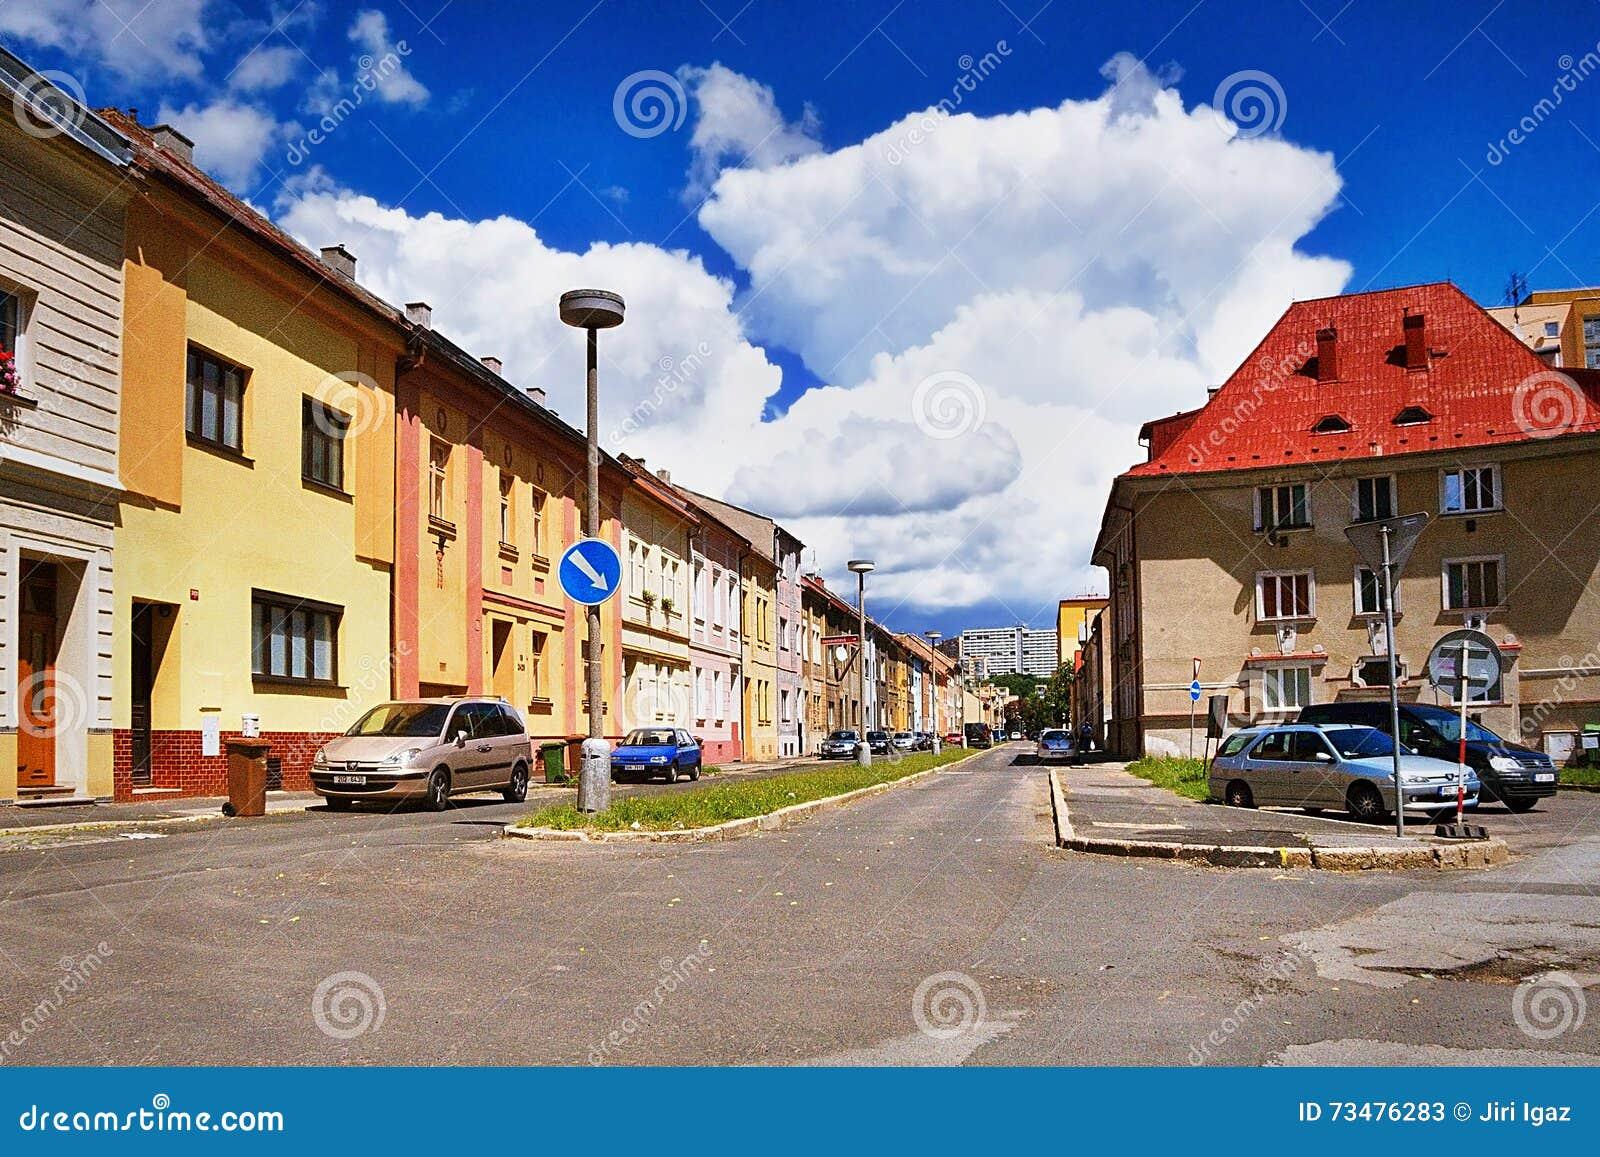 2016/06/18 - Chomutov市,捷克共和国-与大白色云彩的好的深蓝天空在街道的上房子